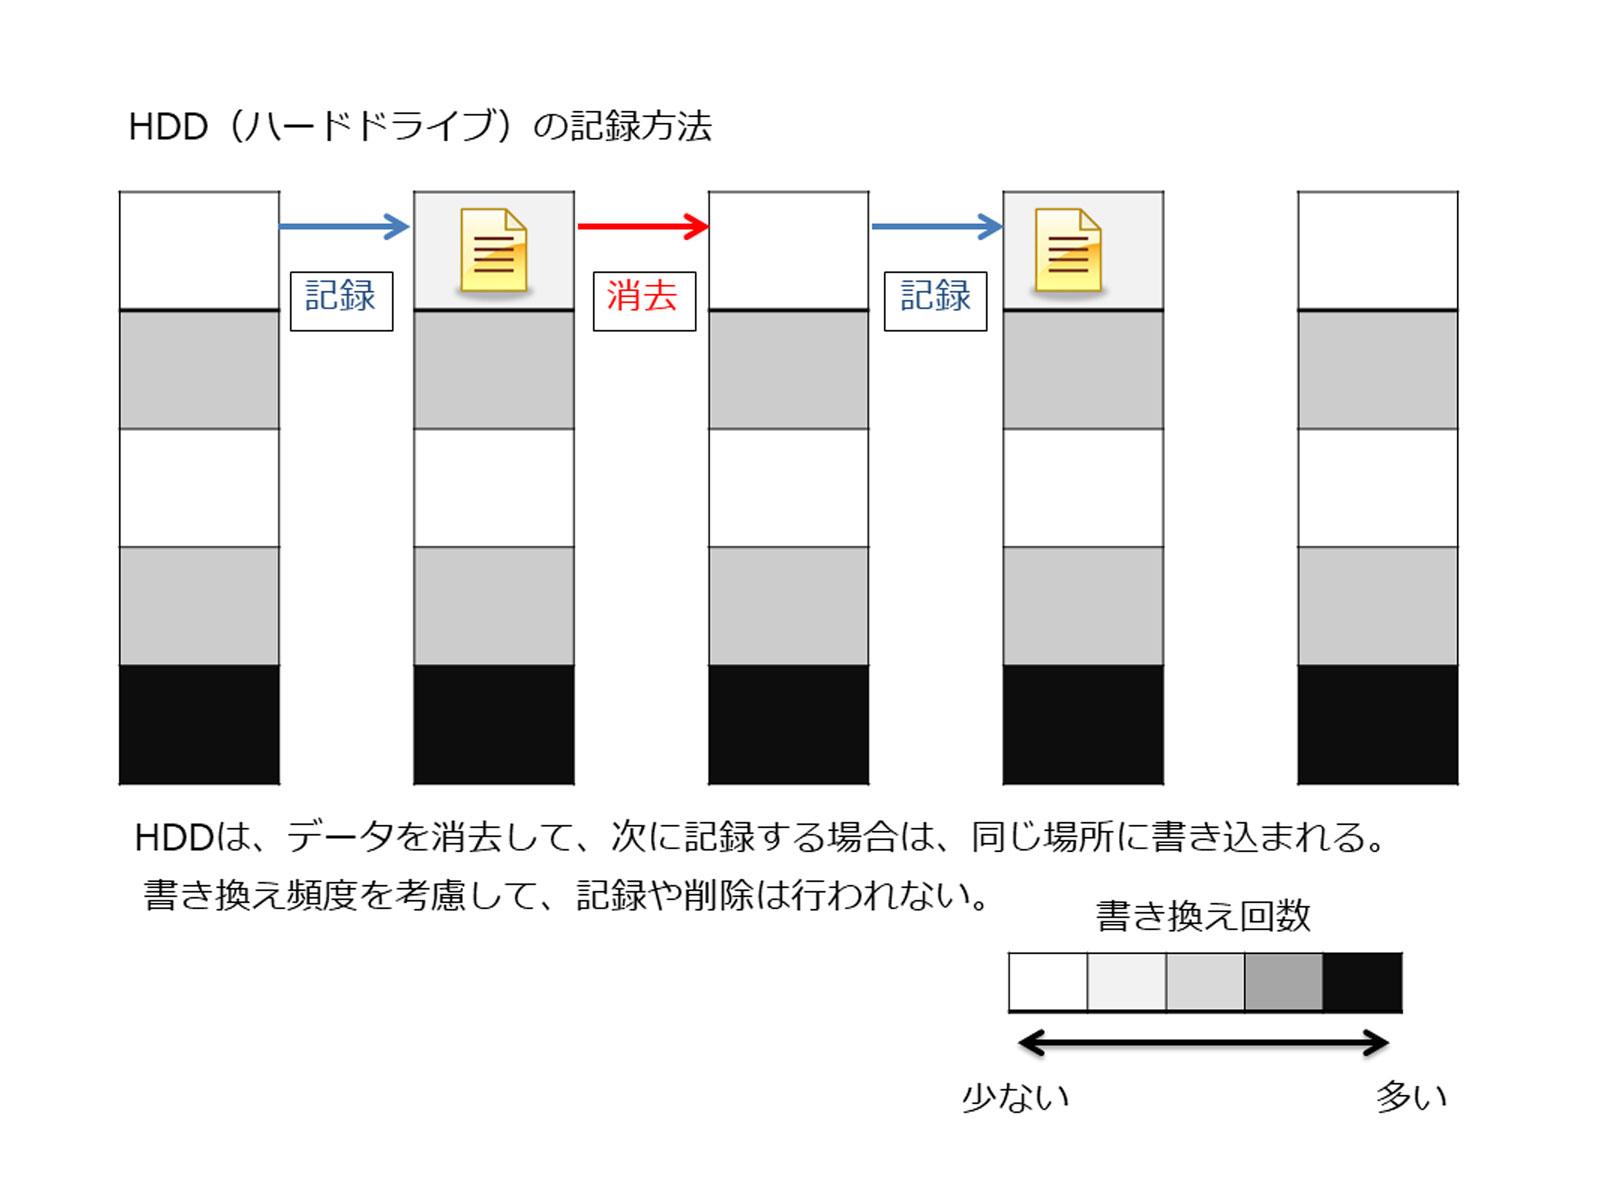 HDDの記録方法